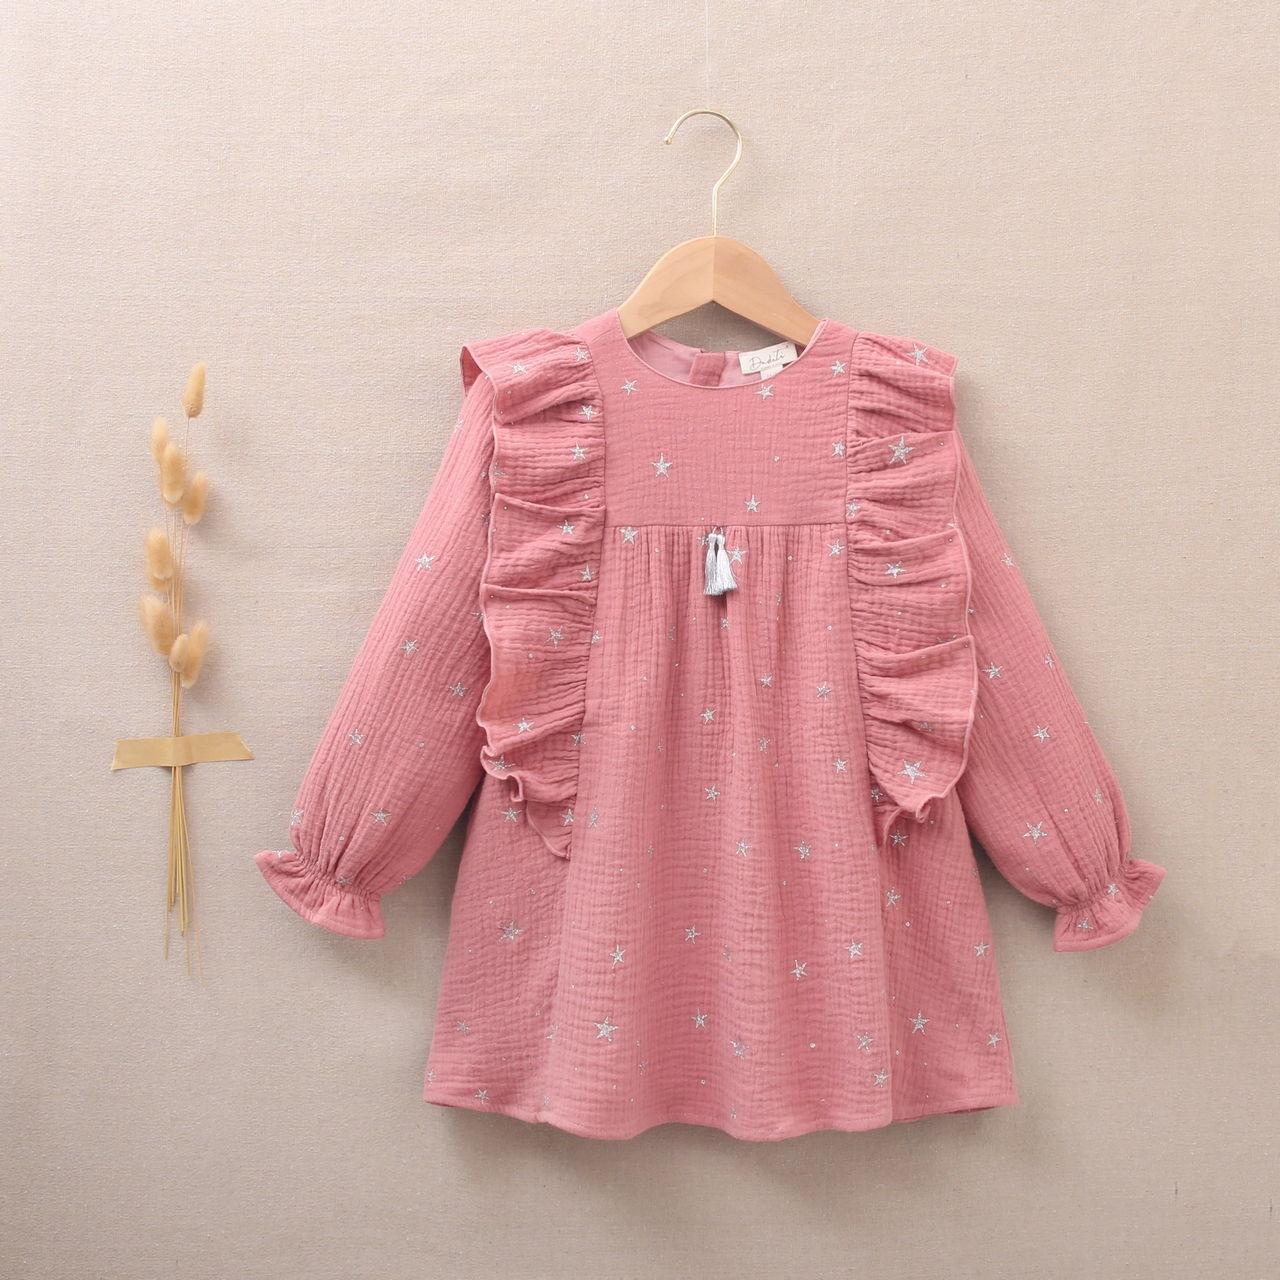 Imagen de Vestido de niña rosa con estrellas plateadas